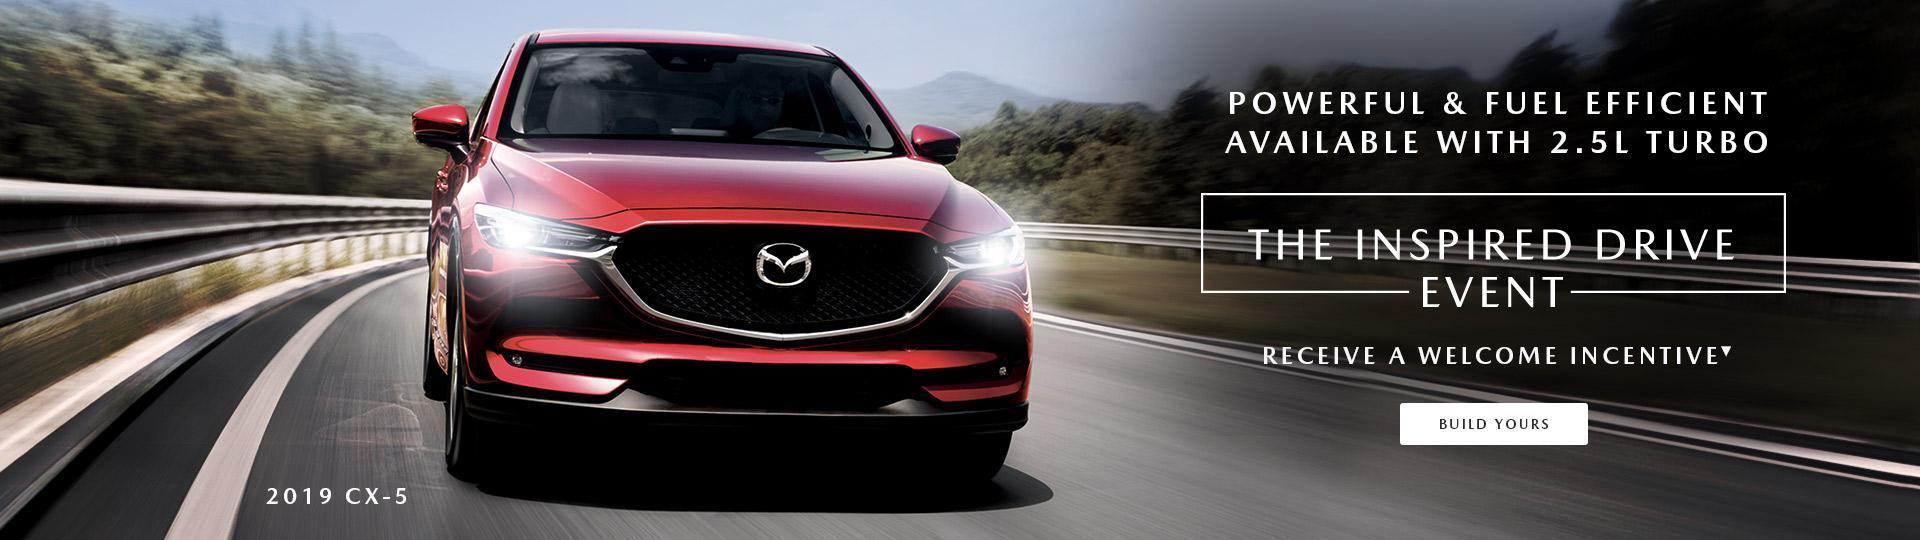 2019 Mazda May Offer